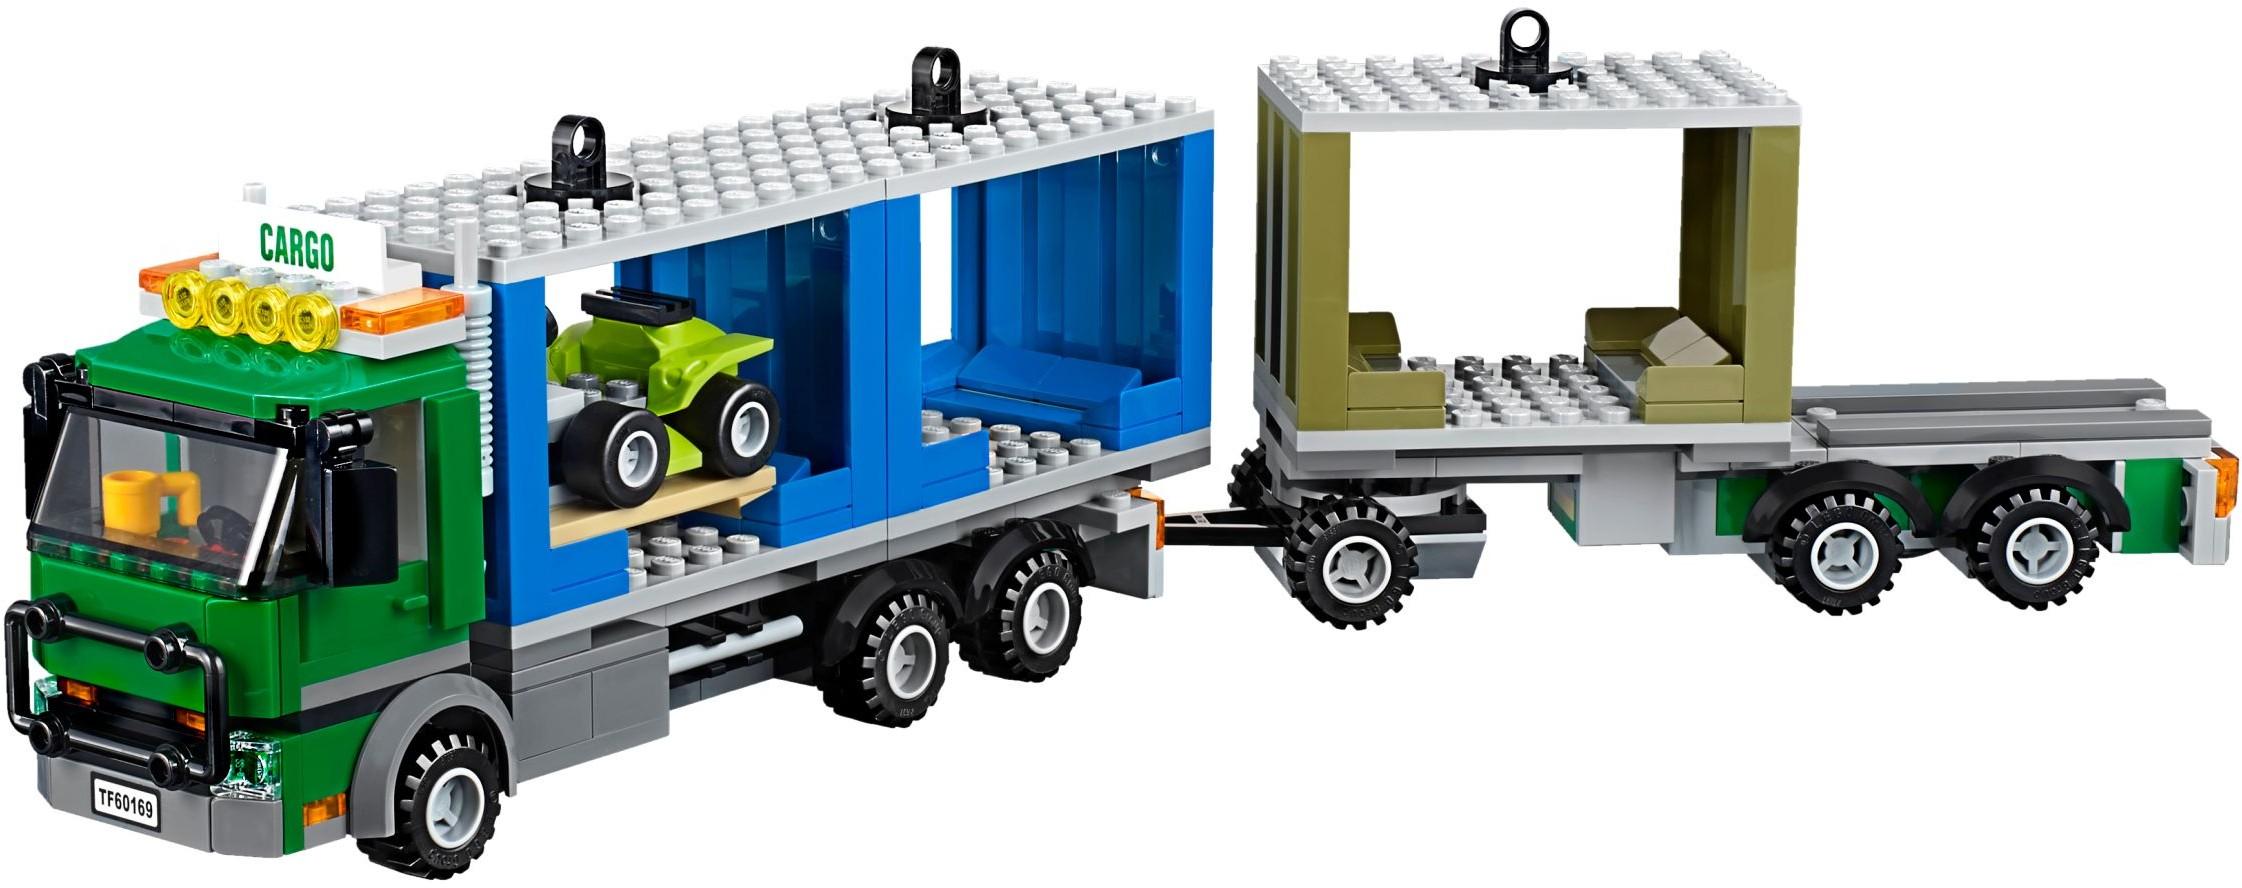 creativeplaycoza 60169 lego174 city cargo terminal